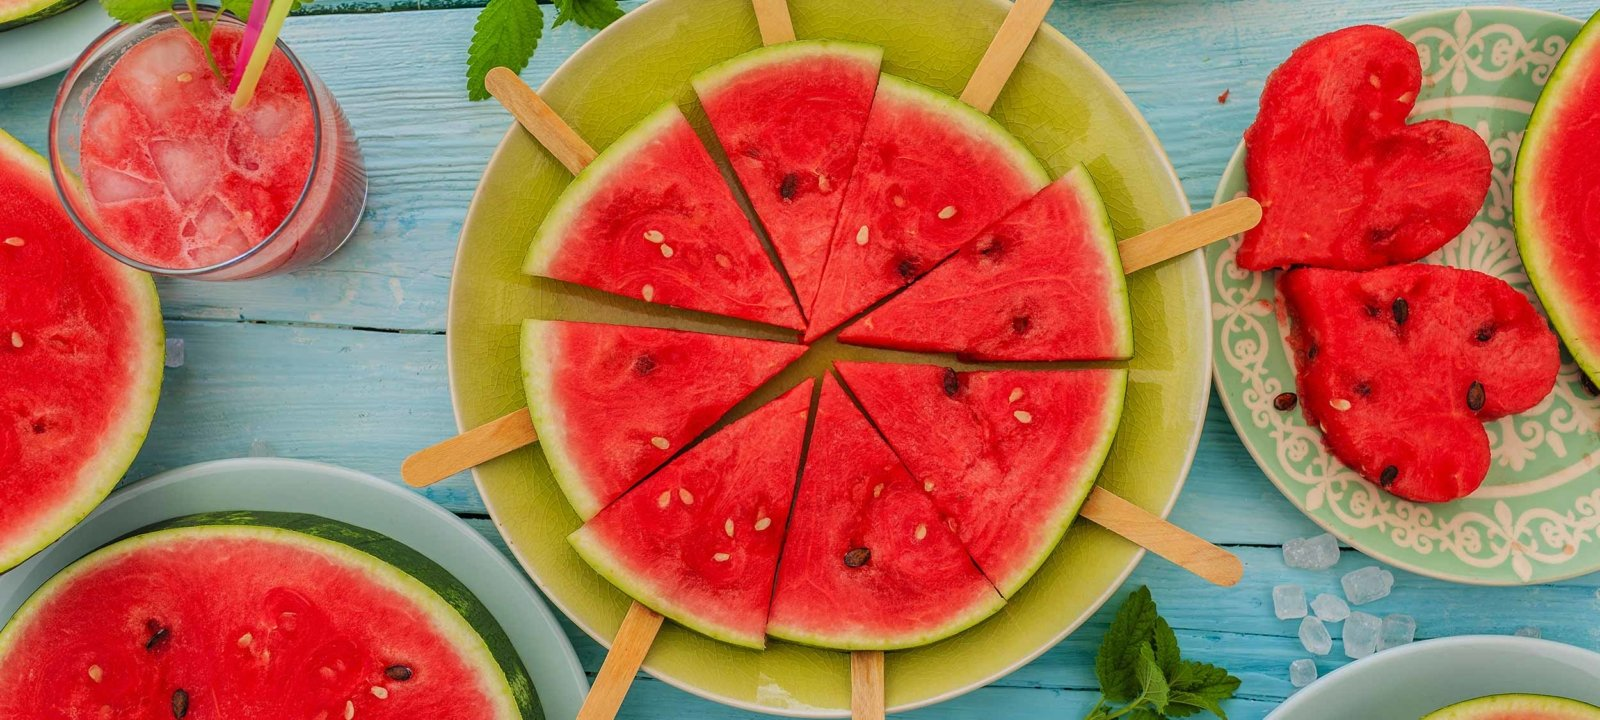 Wassermelone_sommersalate_titel